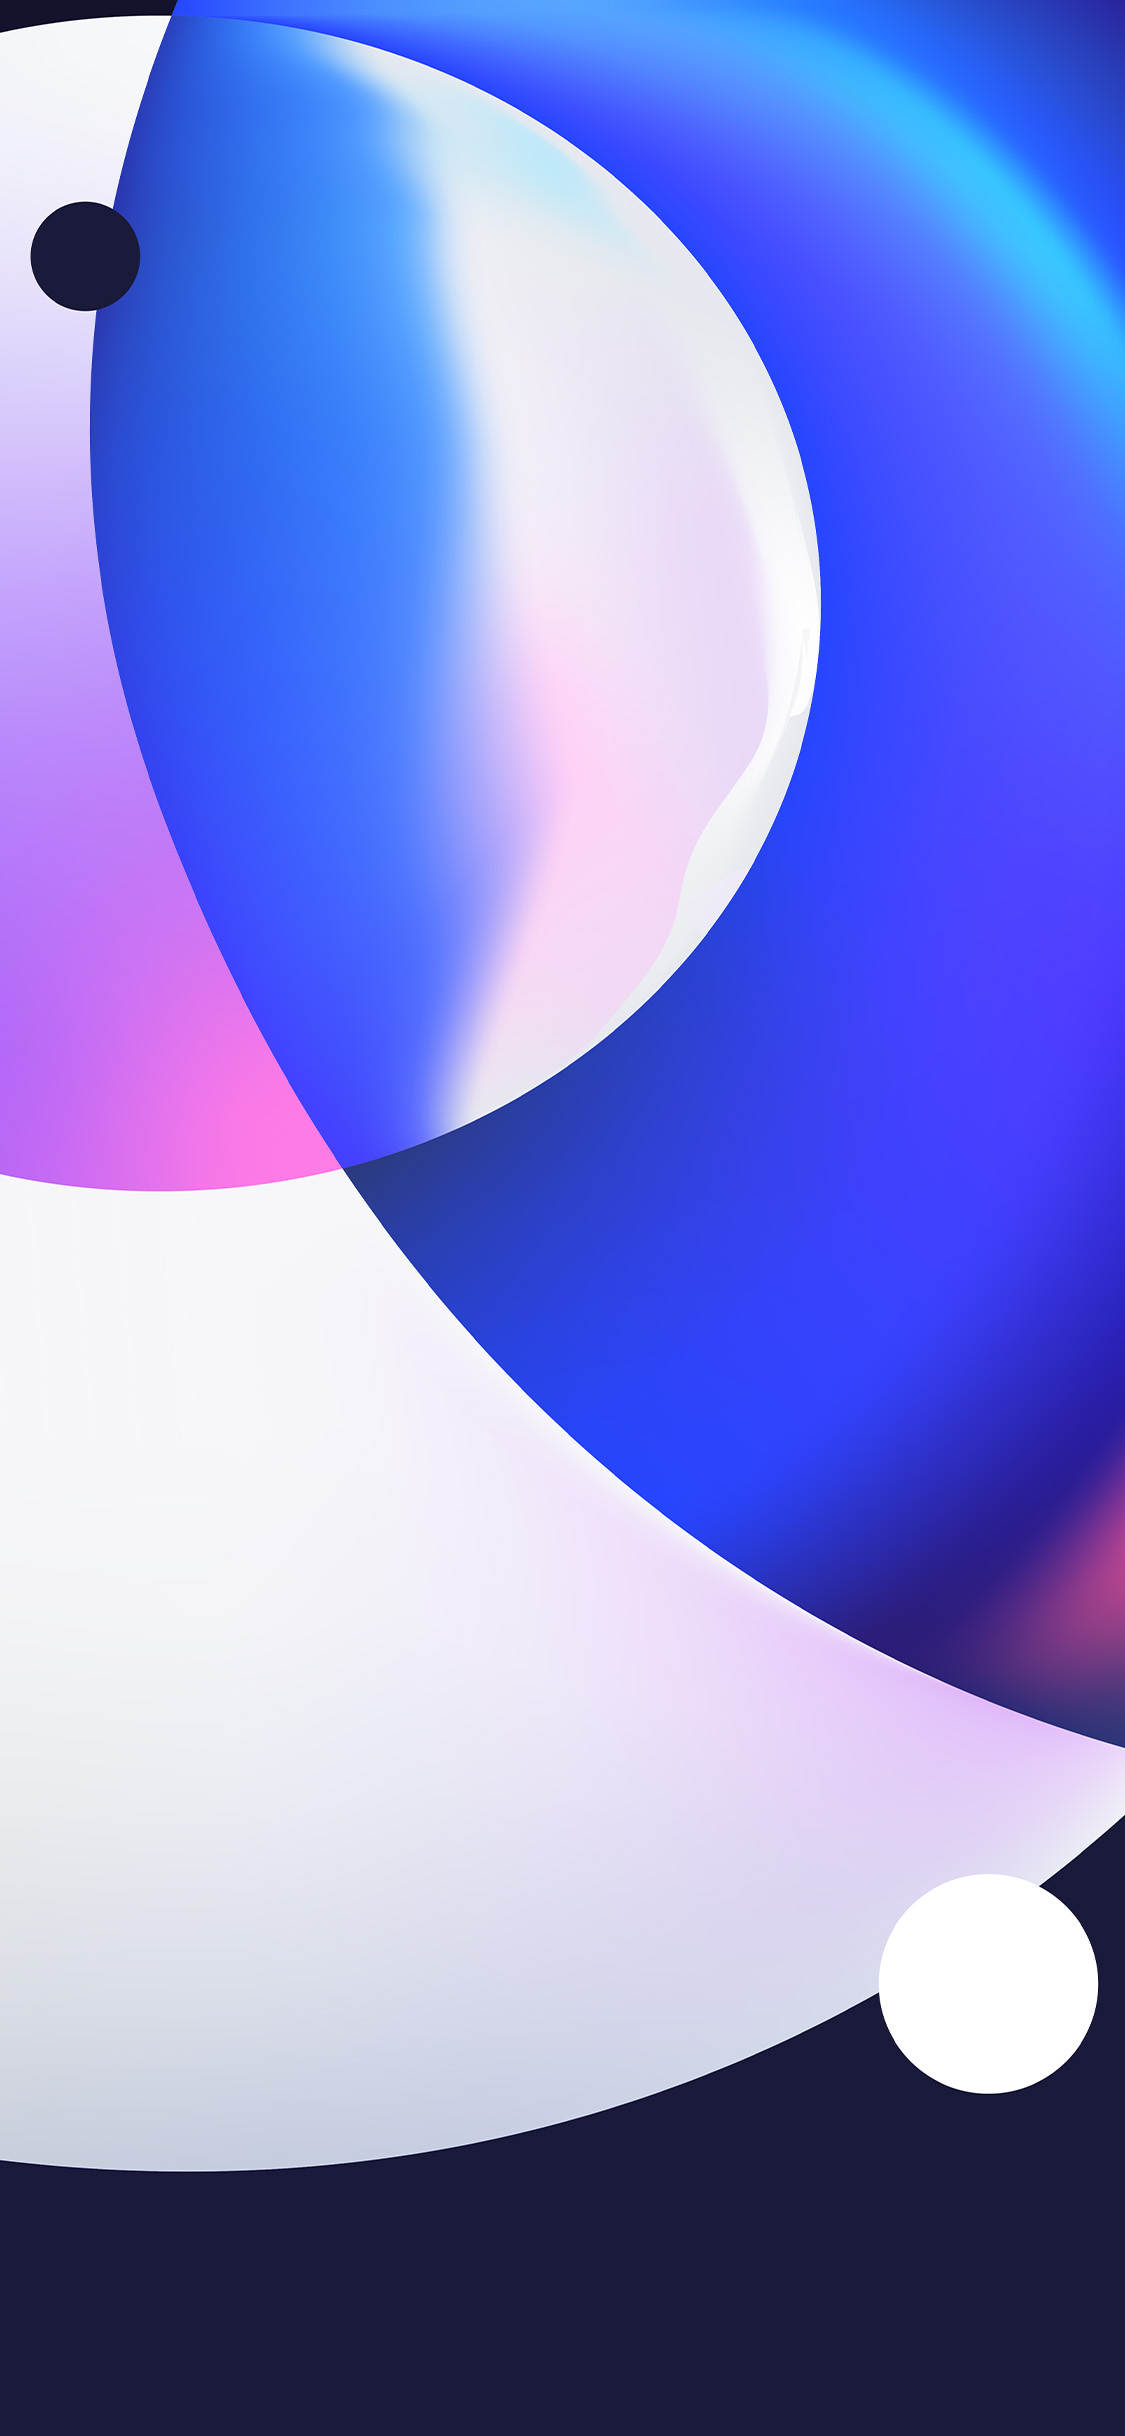 Wallpaper-007